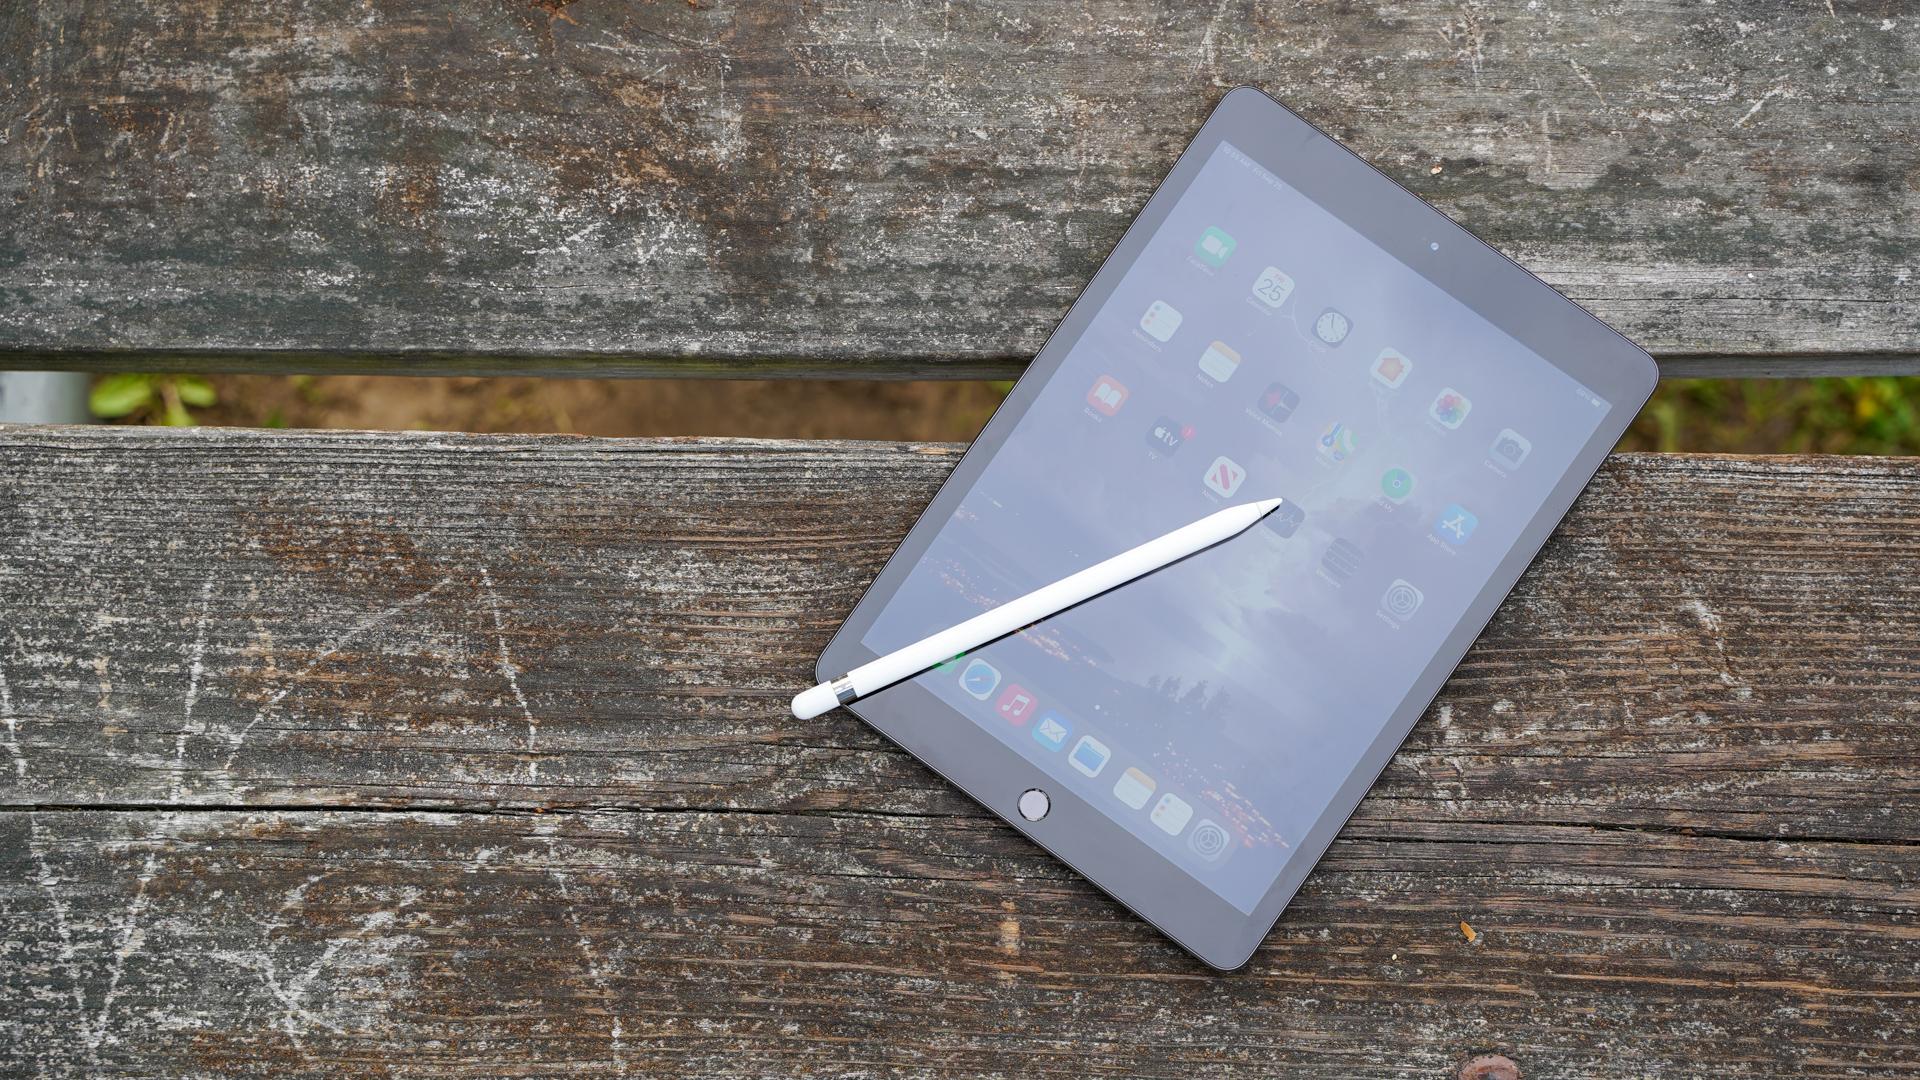 Apple iPad 2020 with Apple Pencil